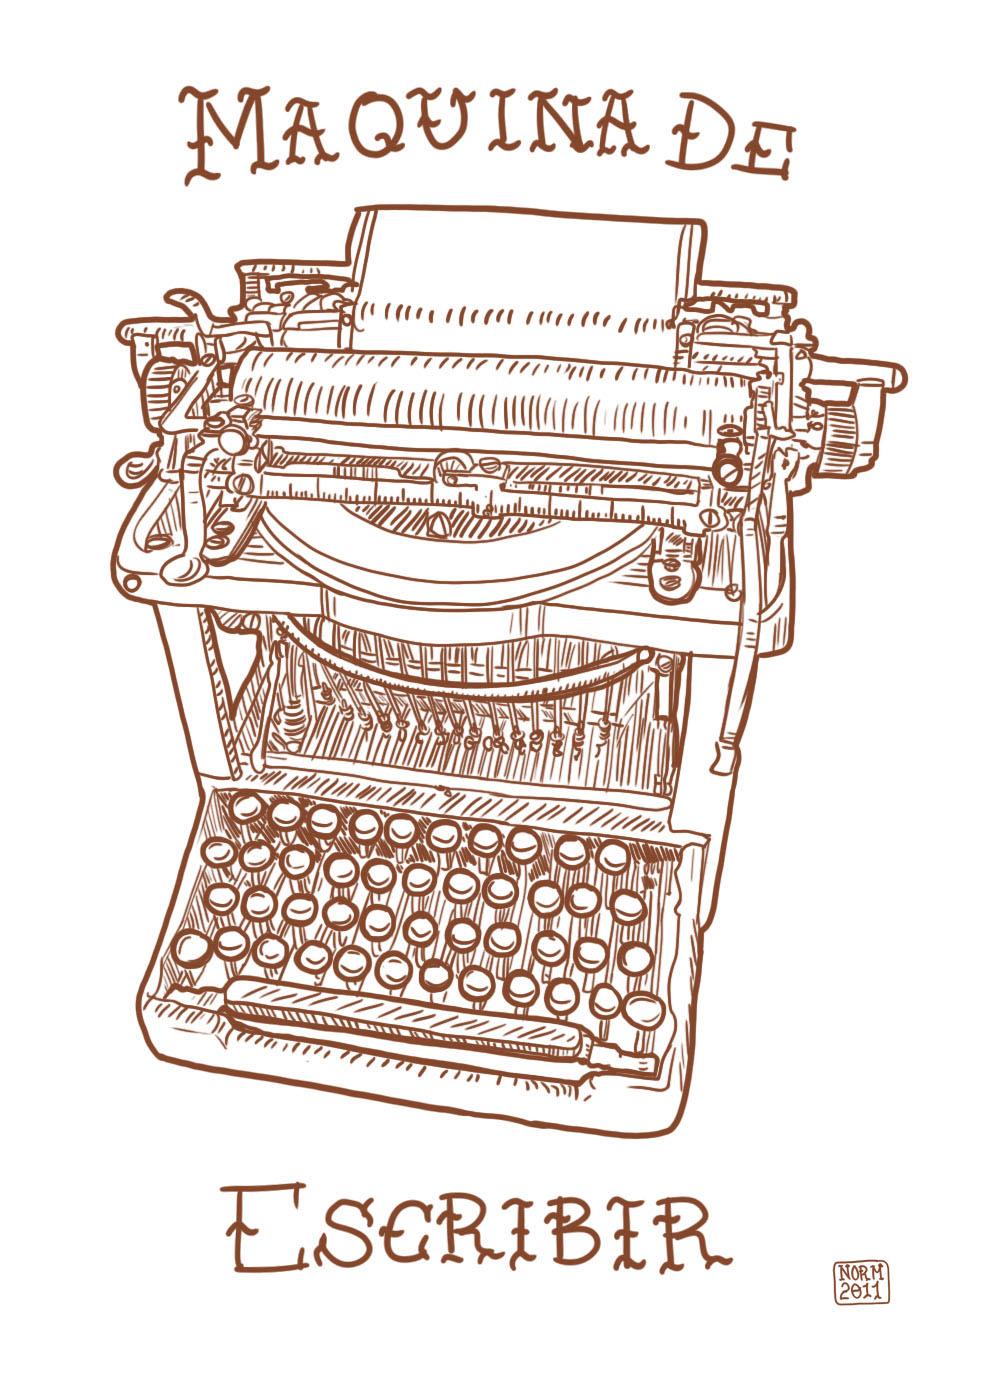 type5x7 (1).jpg